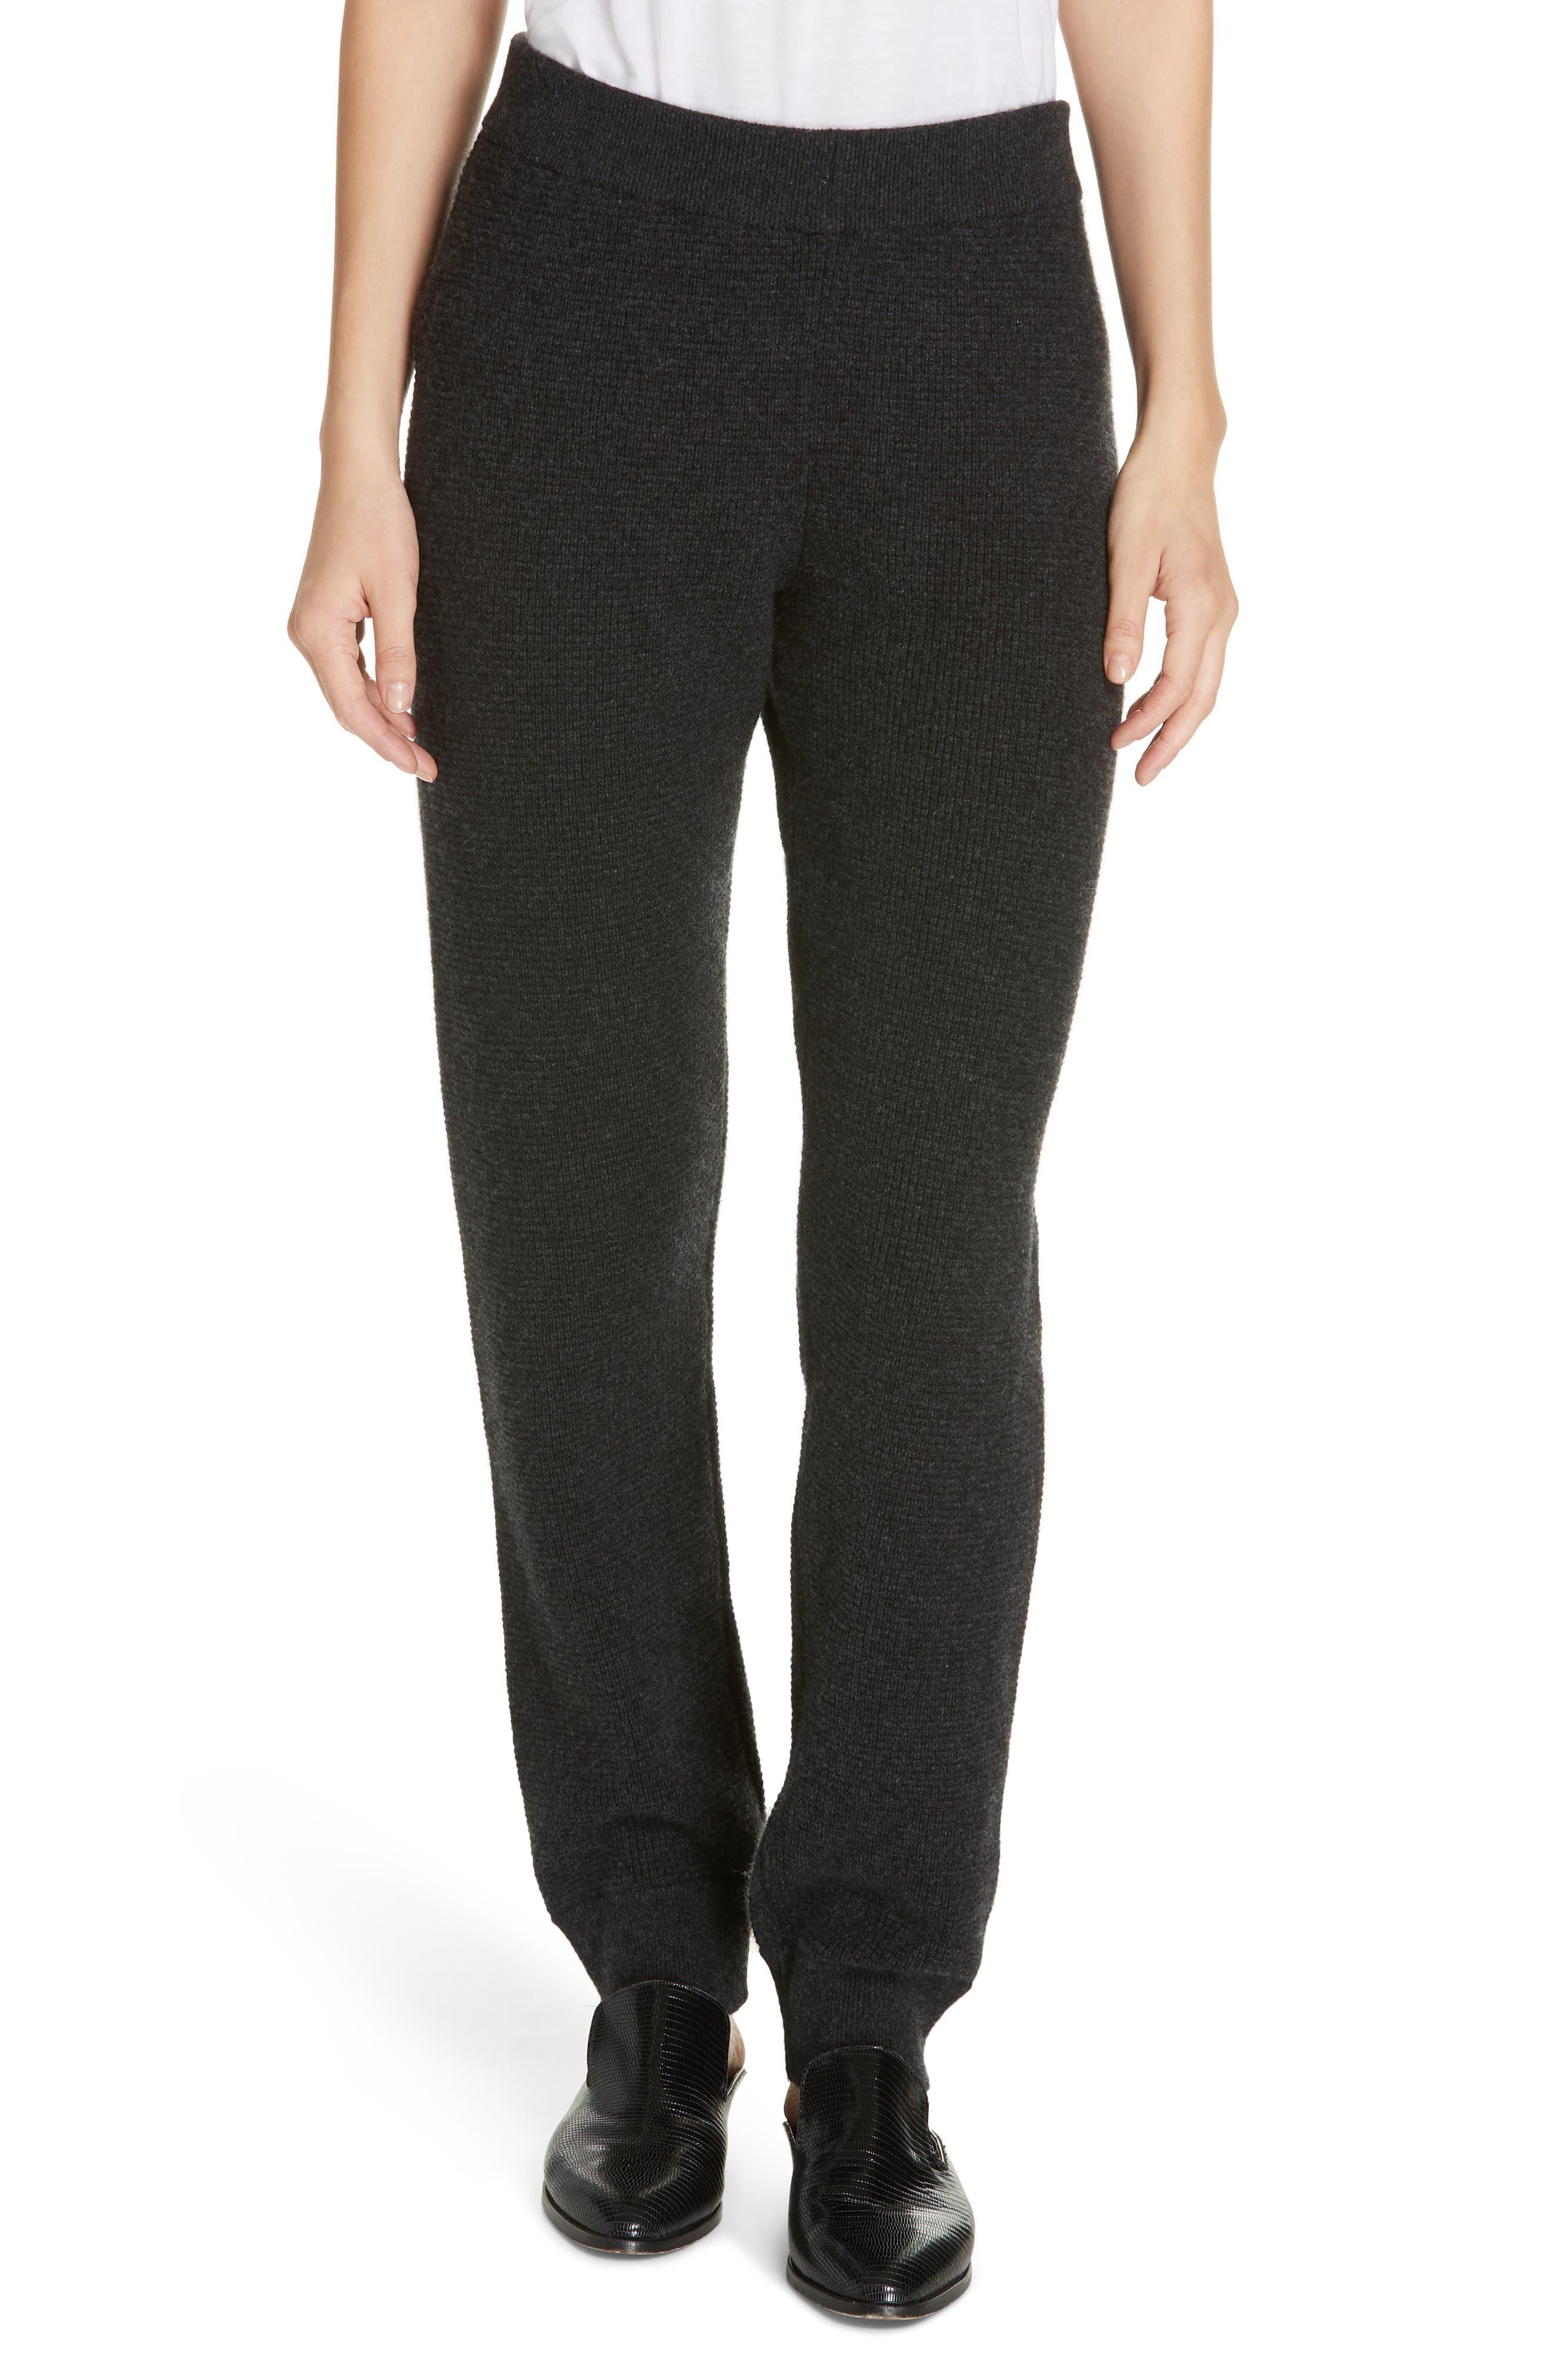 JENNI KAYNE Thermal Cashmere Sweatpants in Charcoal